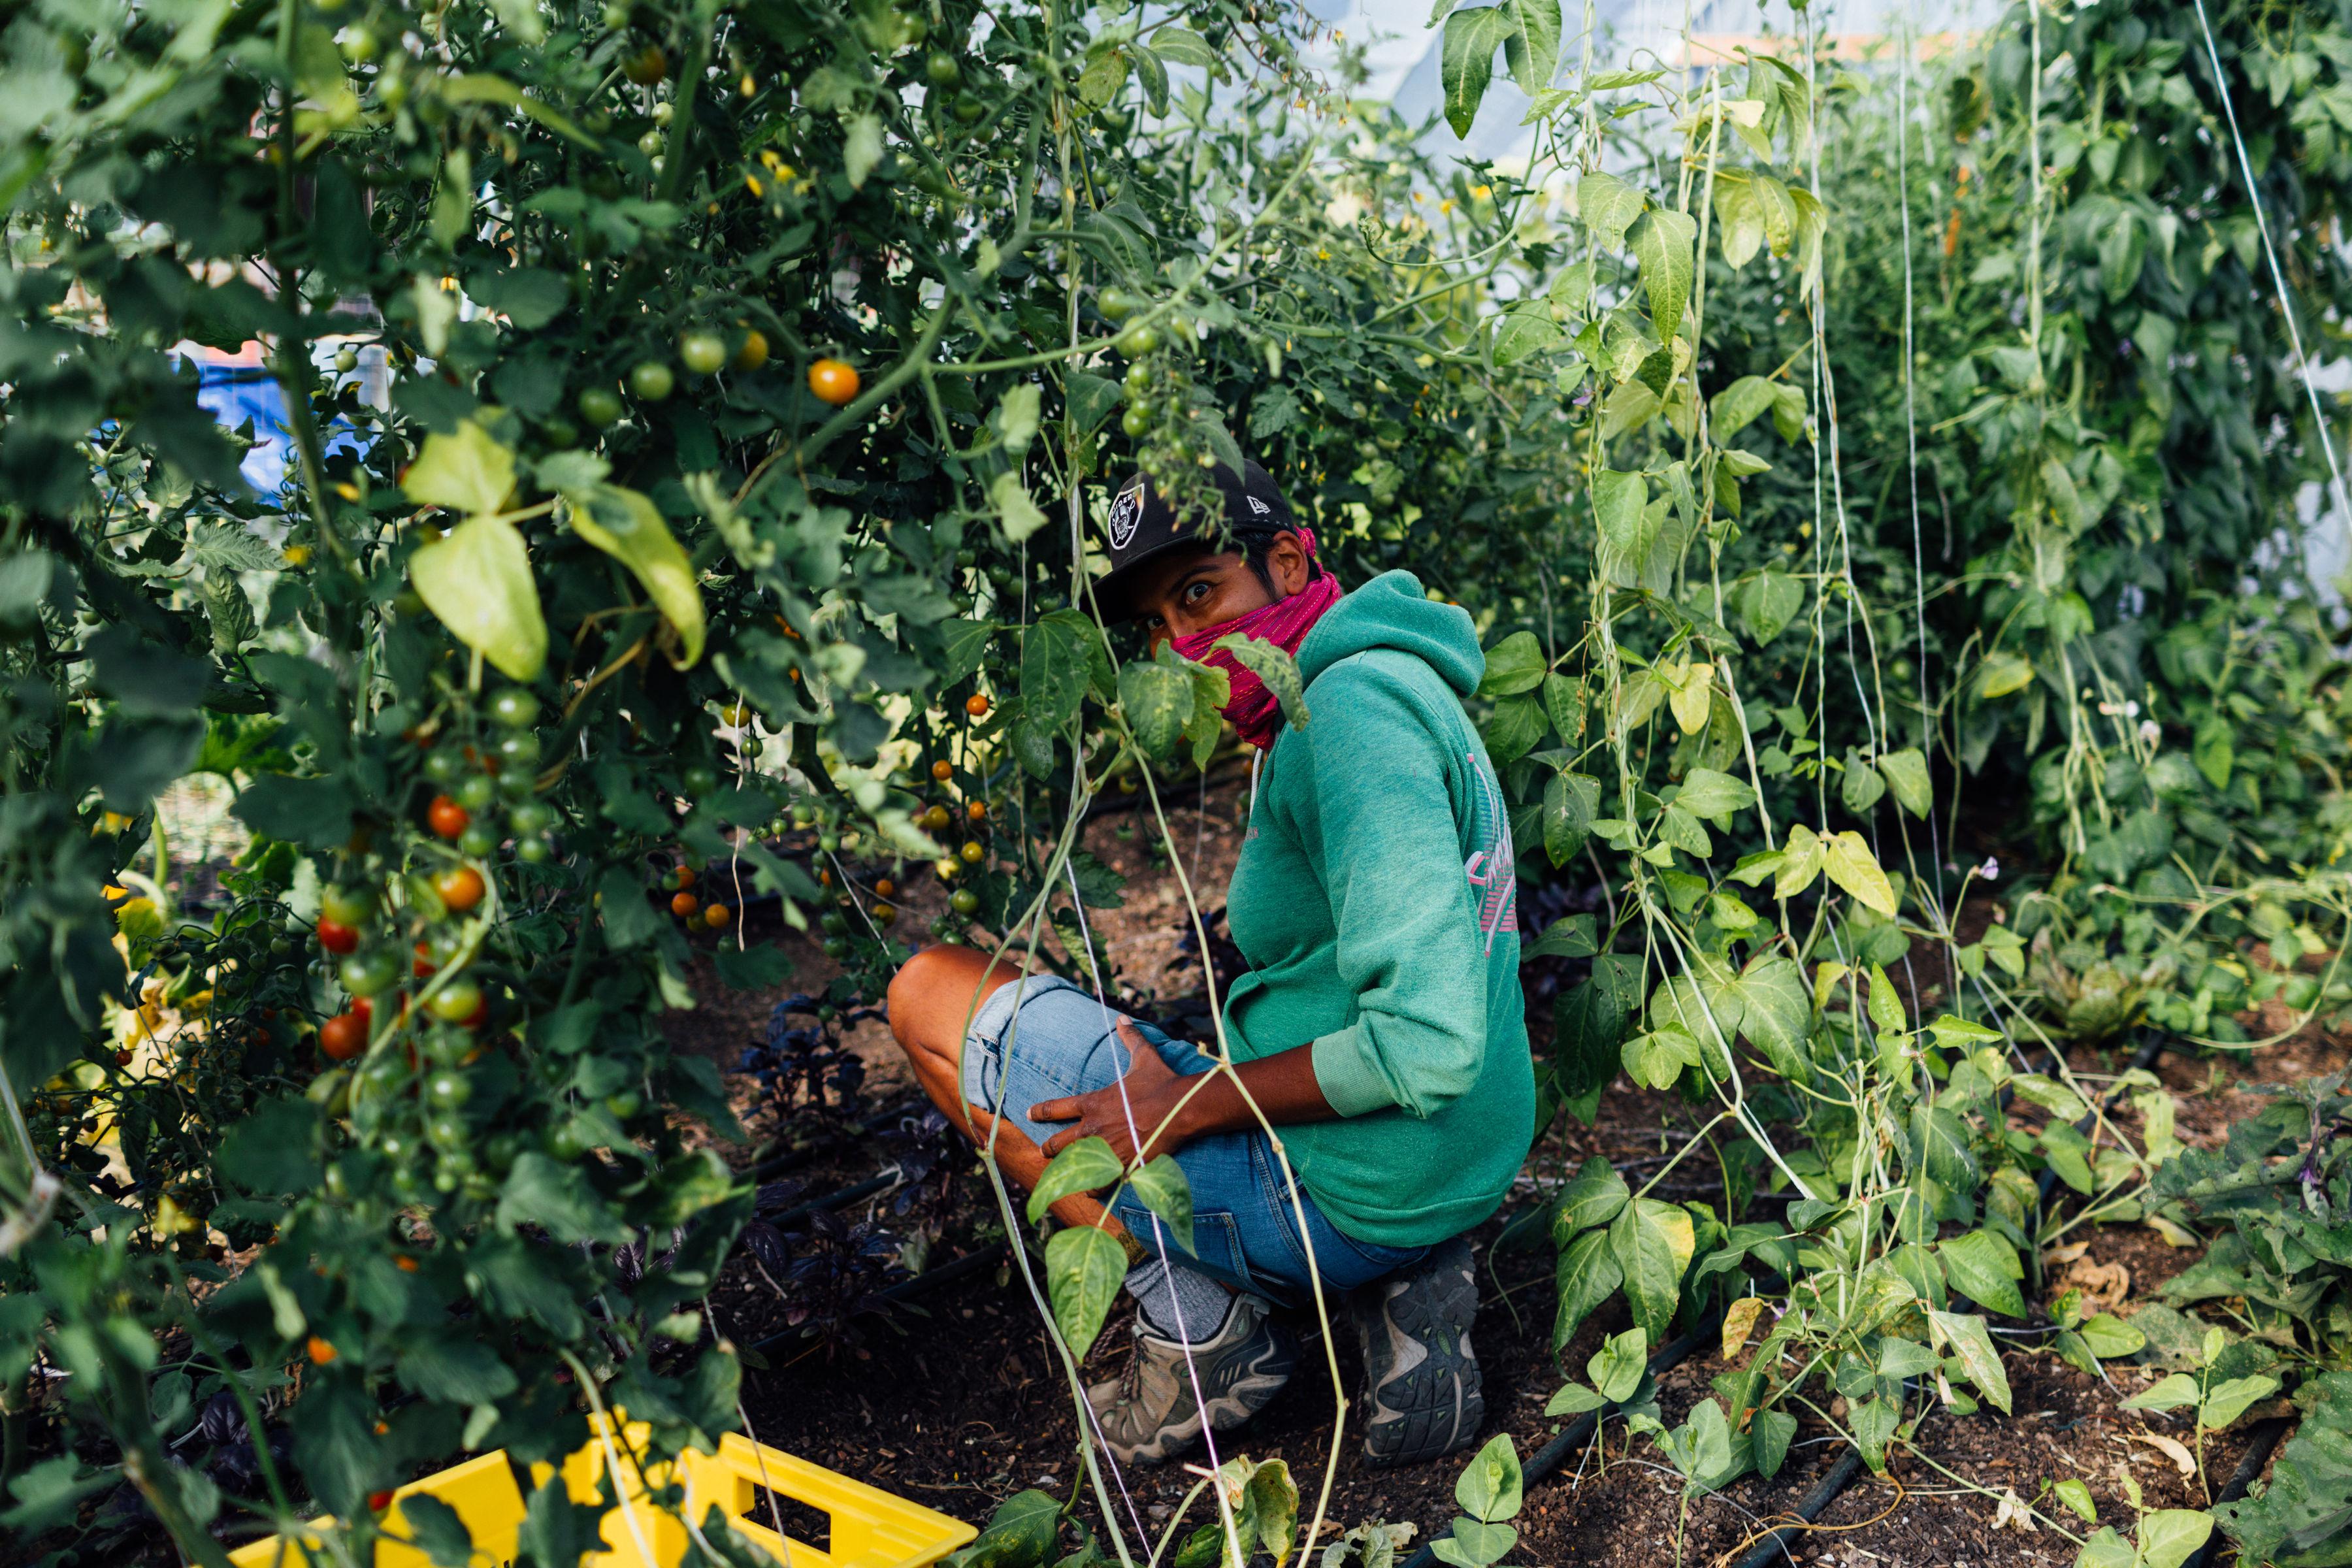 Preeti Mistry at work at Radical Family Farms